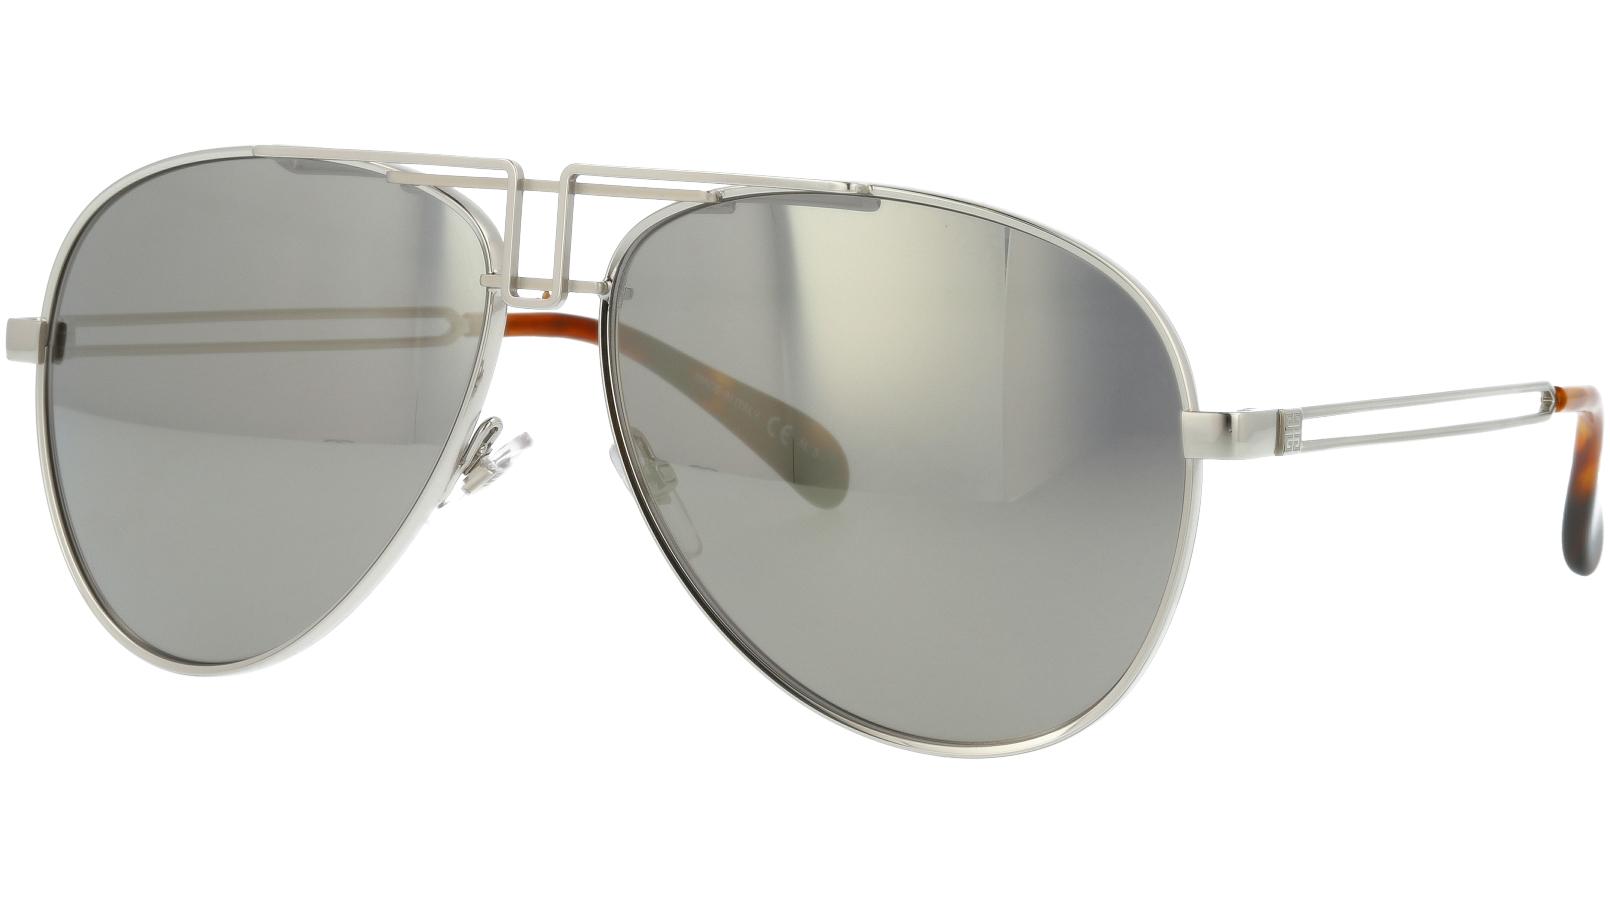 Givenchy GV7110S J5GNQ 61 Gold Sunglasses